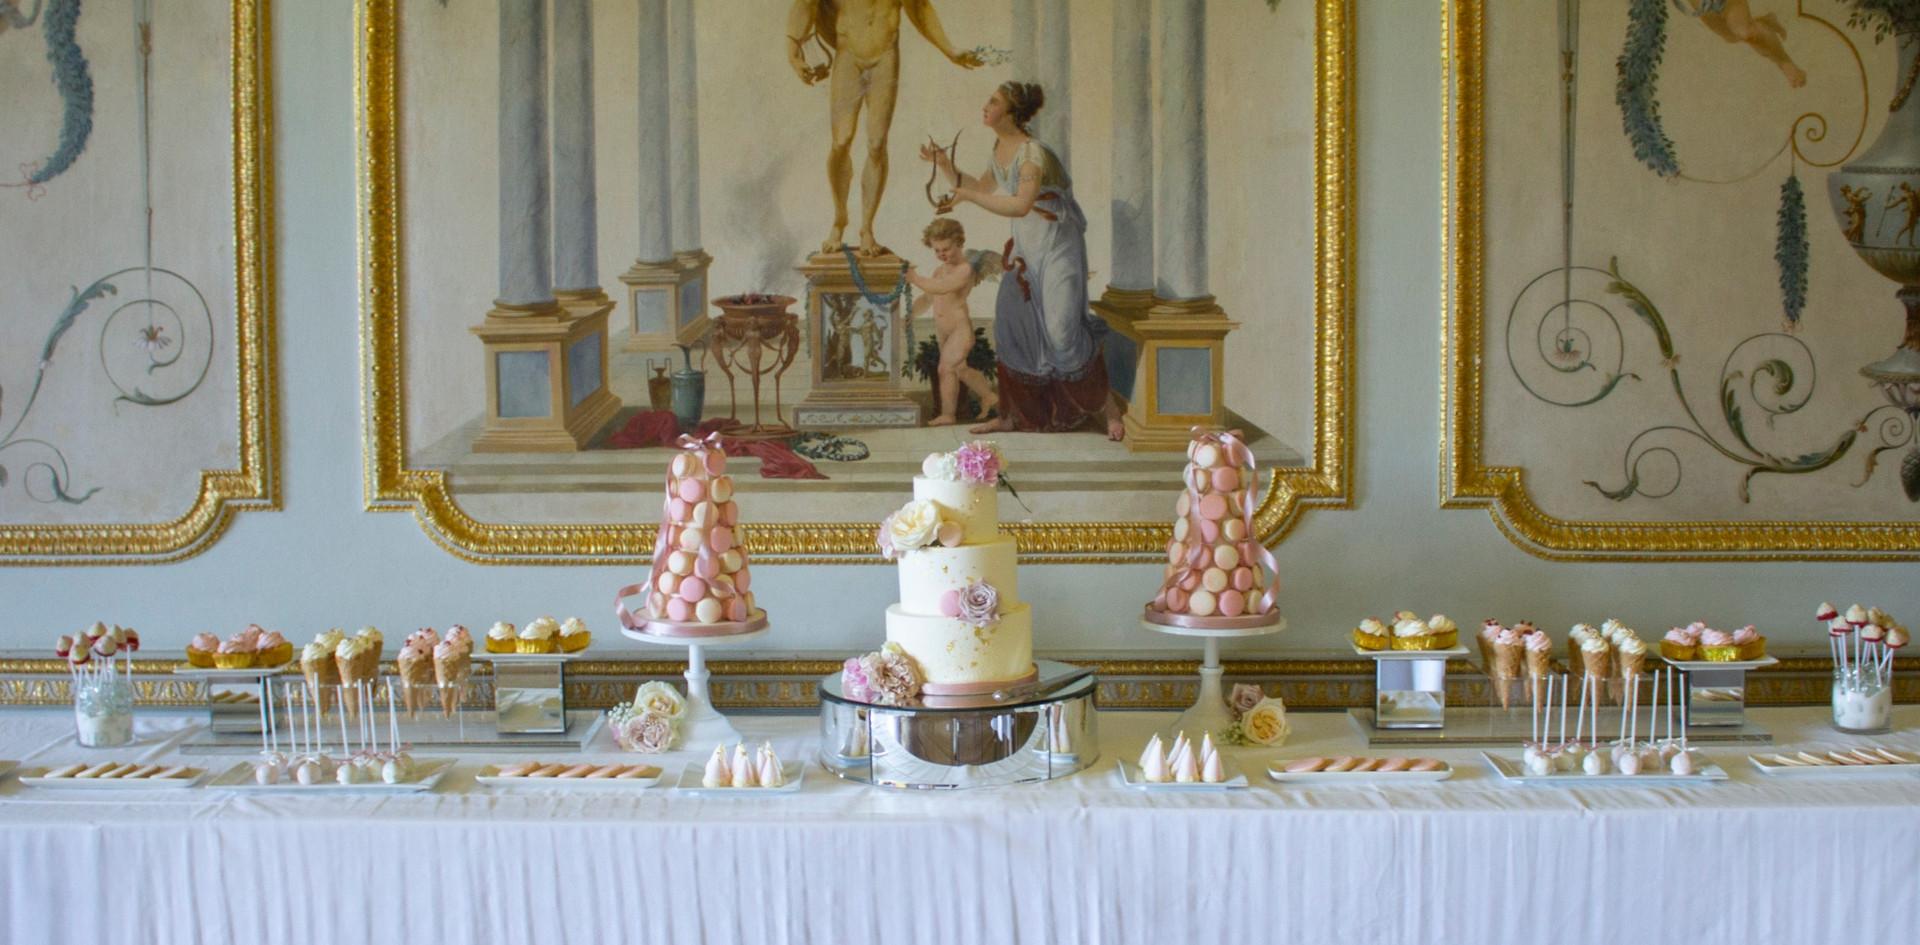 Stowe House Dessert Table